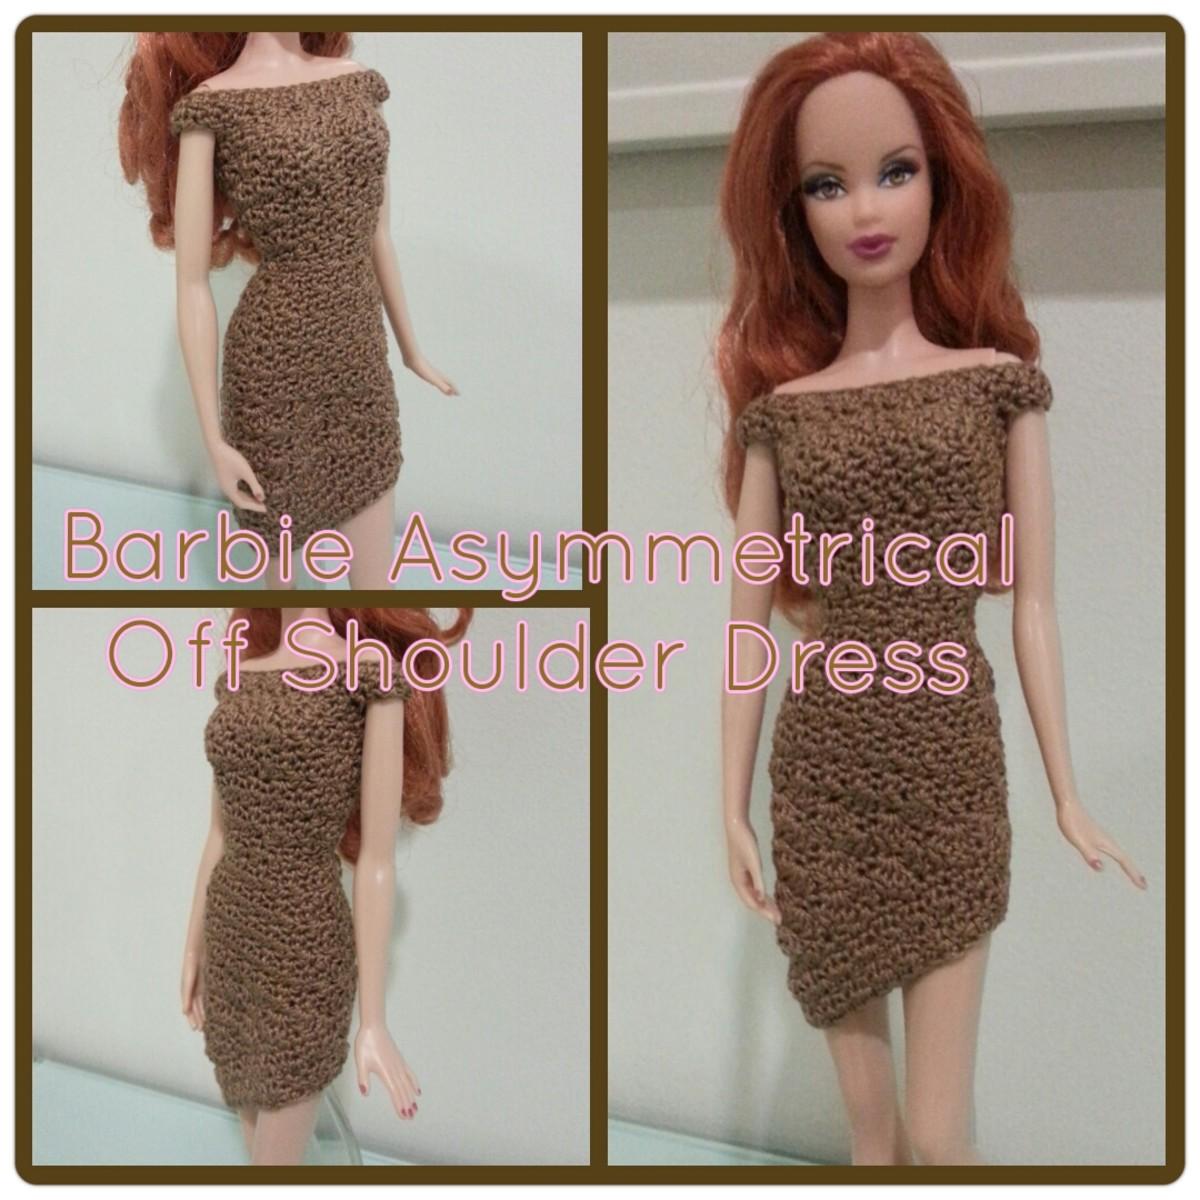 Barbie Asymmetrical Off Shoulder Dress